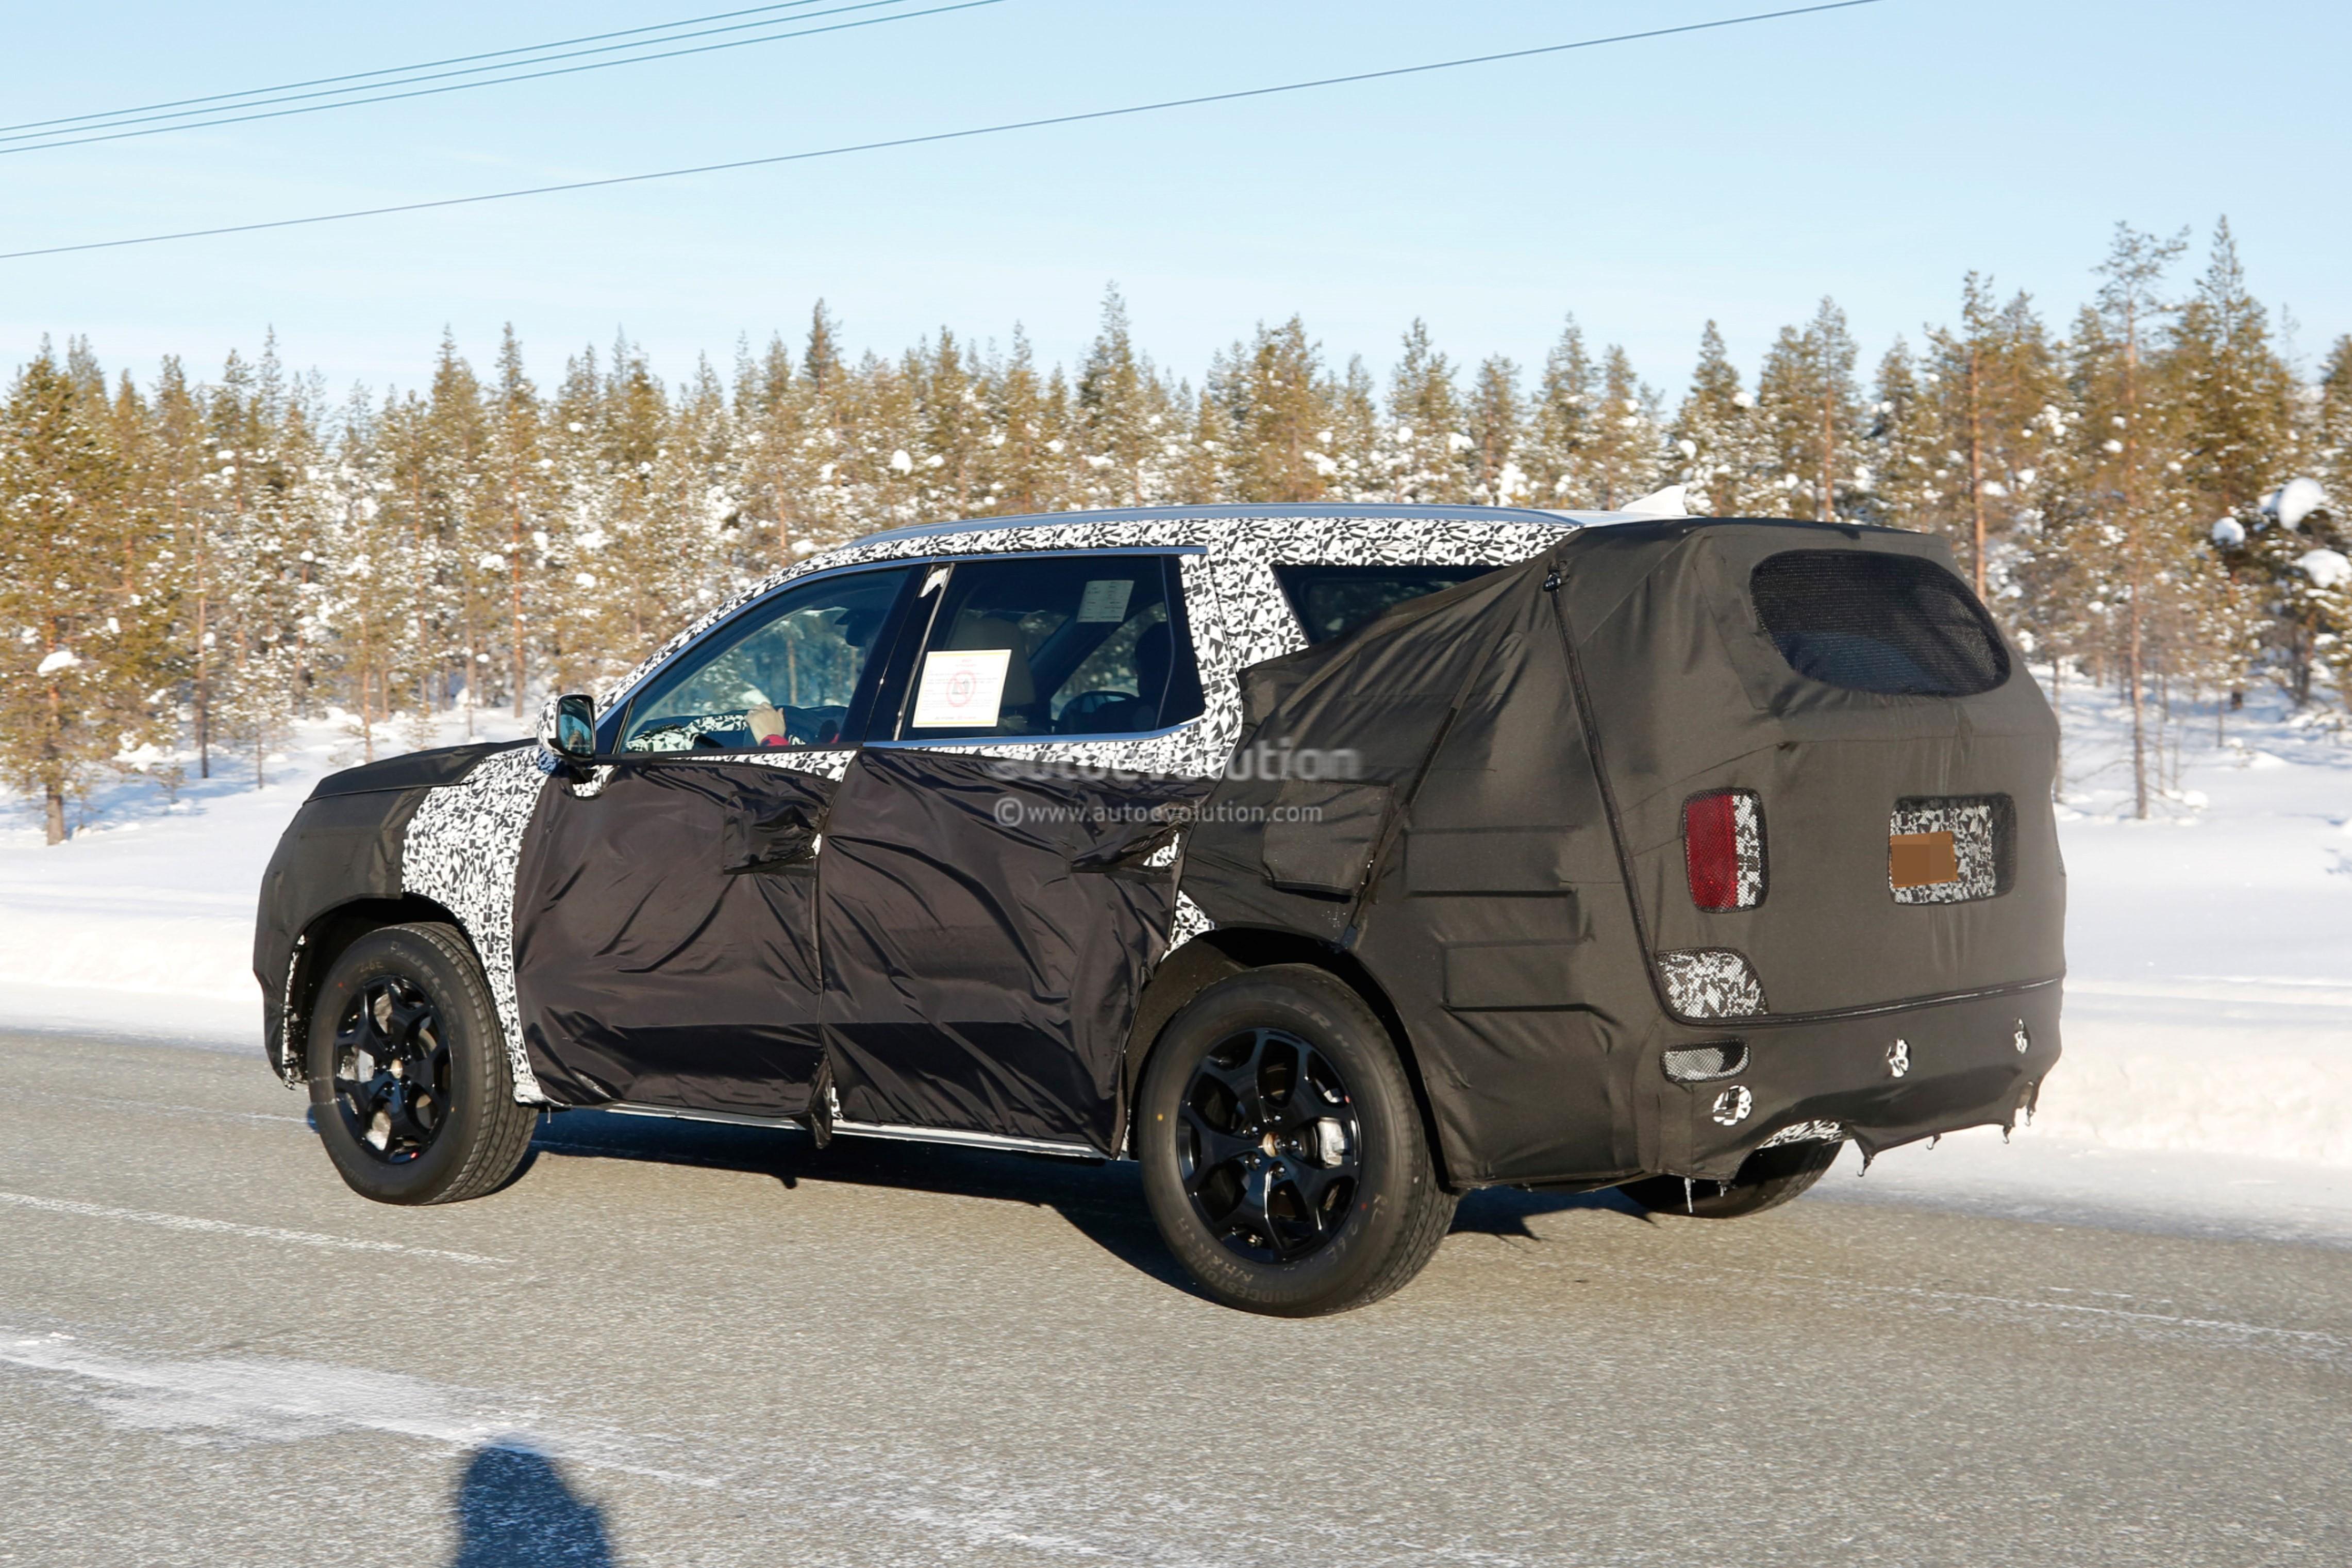 2020 Hyundai Large SUV Looks Massive In Latest Spy Photos ...